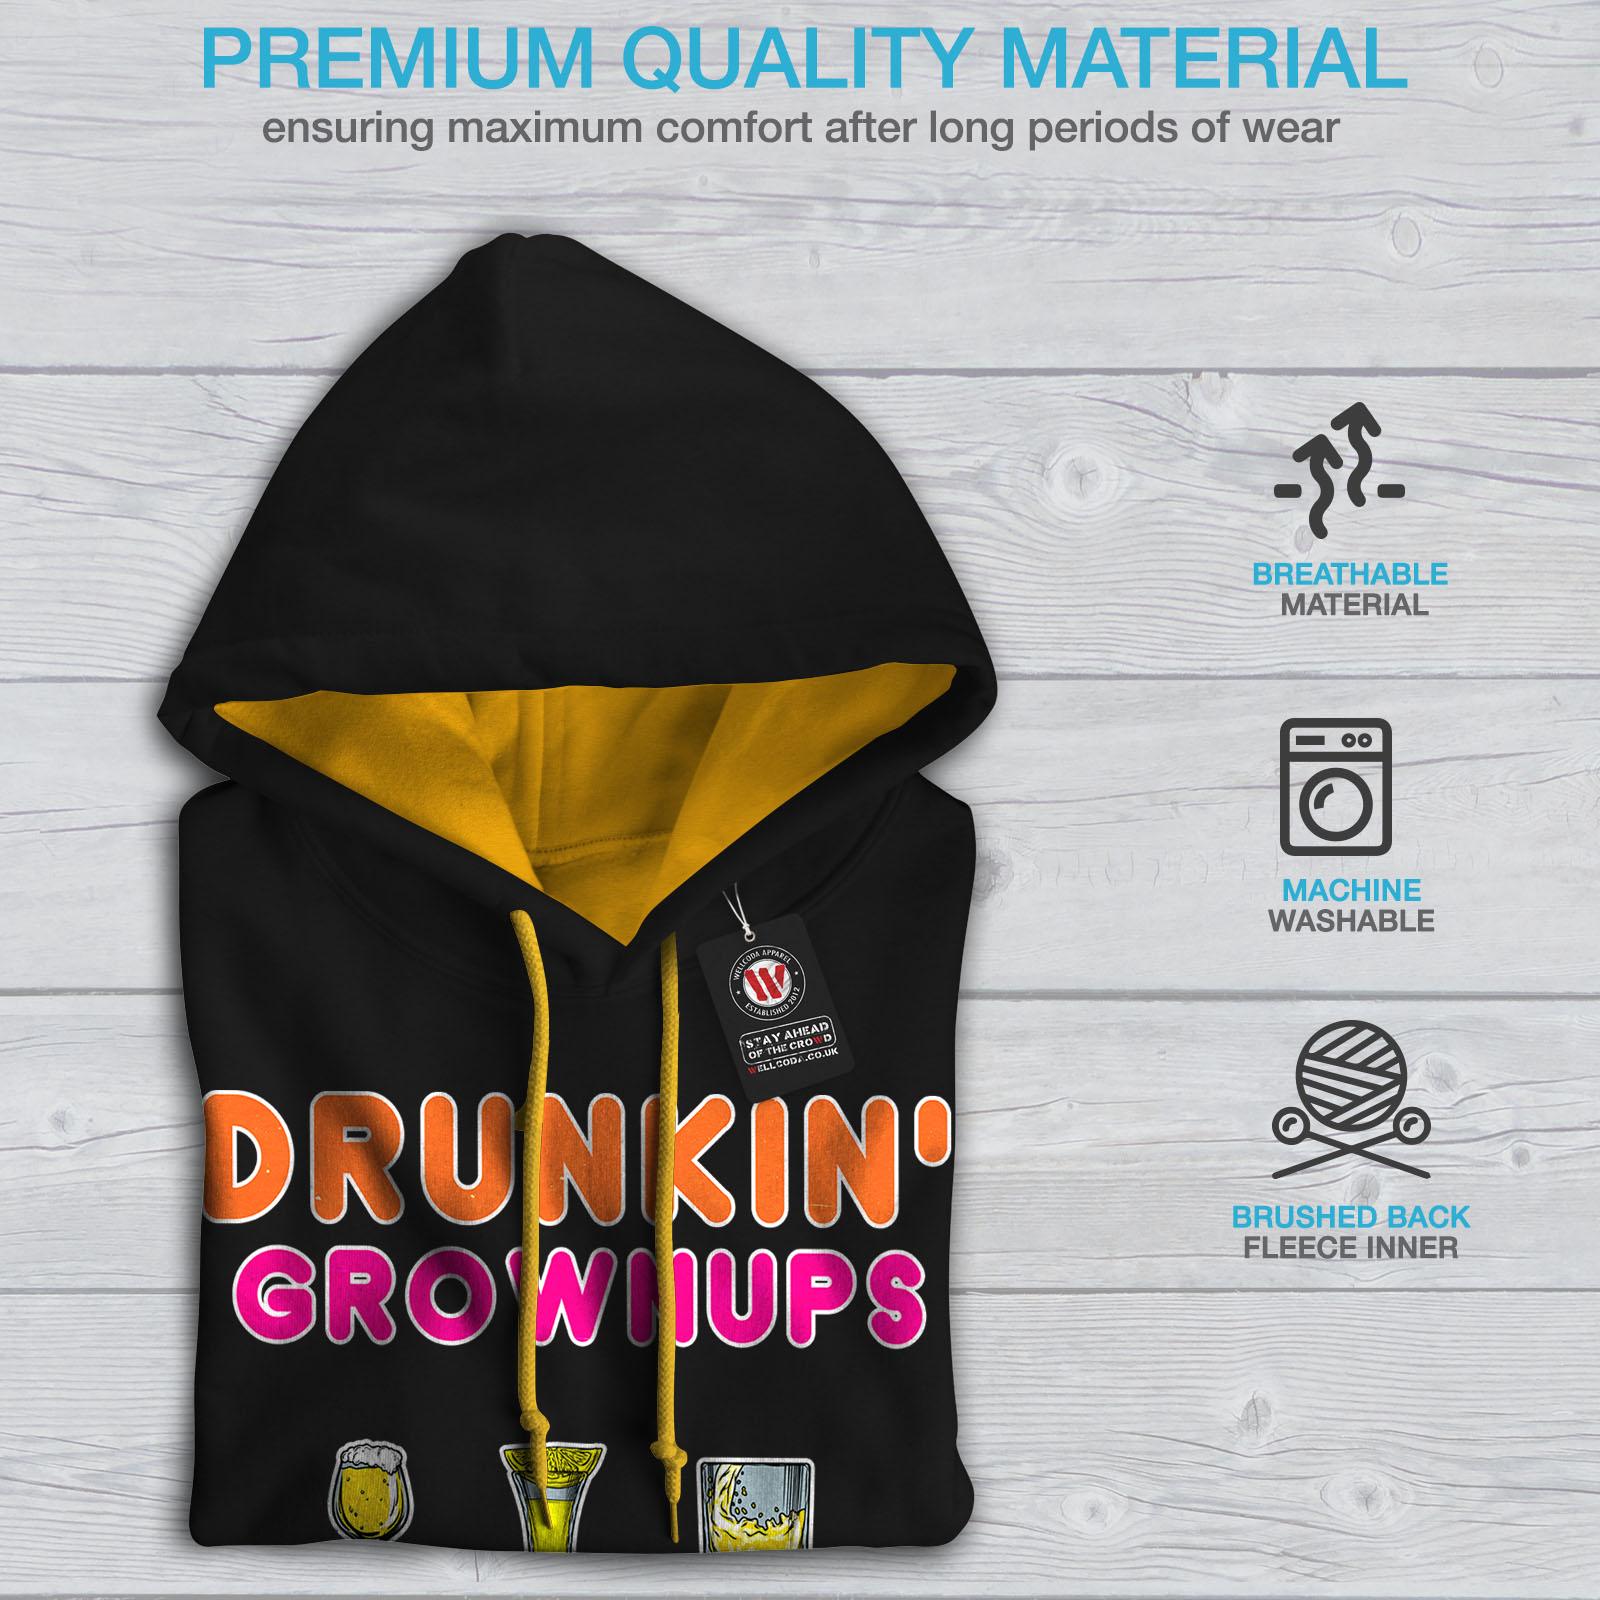 Wellcoda Mens Casual oro cappuccio Contrast Felpa Jumper Black con cappuccio Adult cresciuto Party Drunk q6RrqS